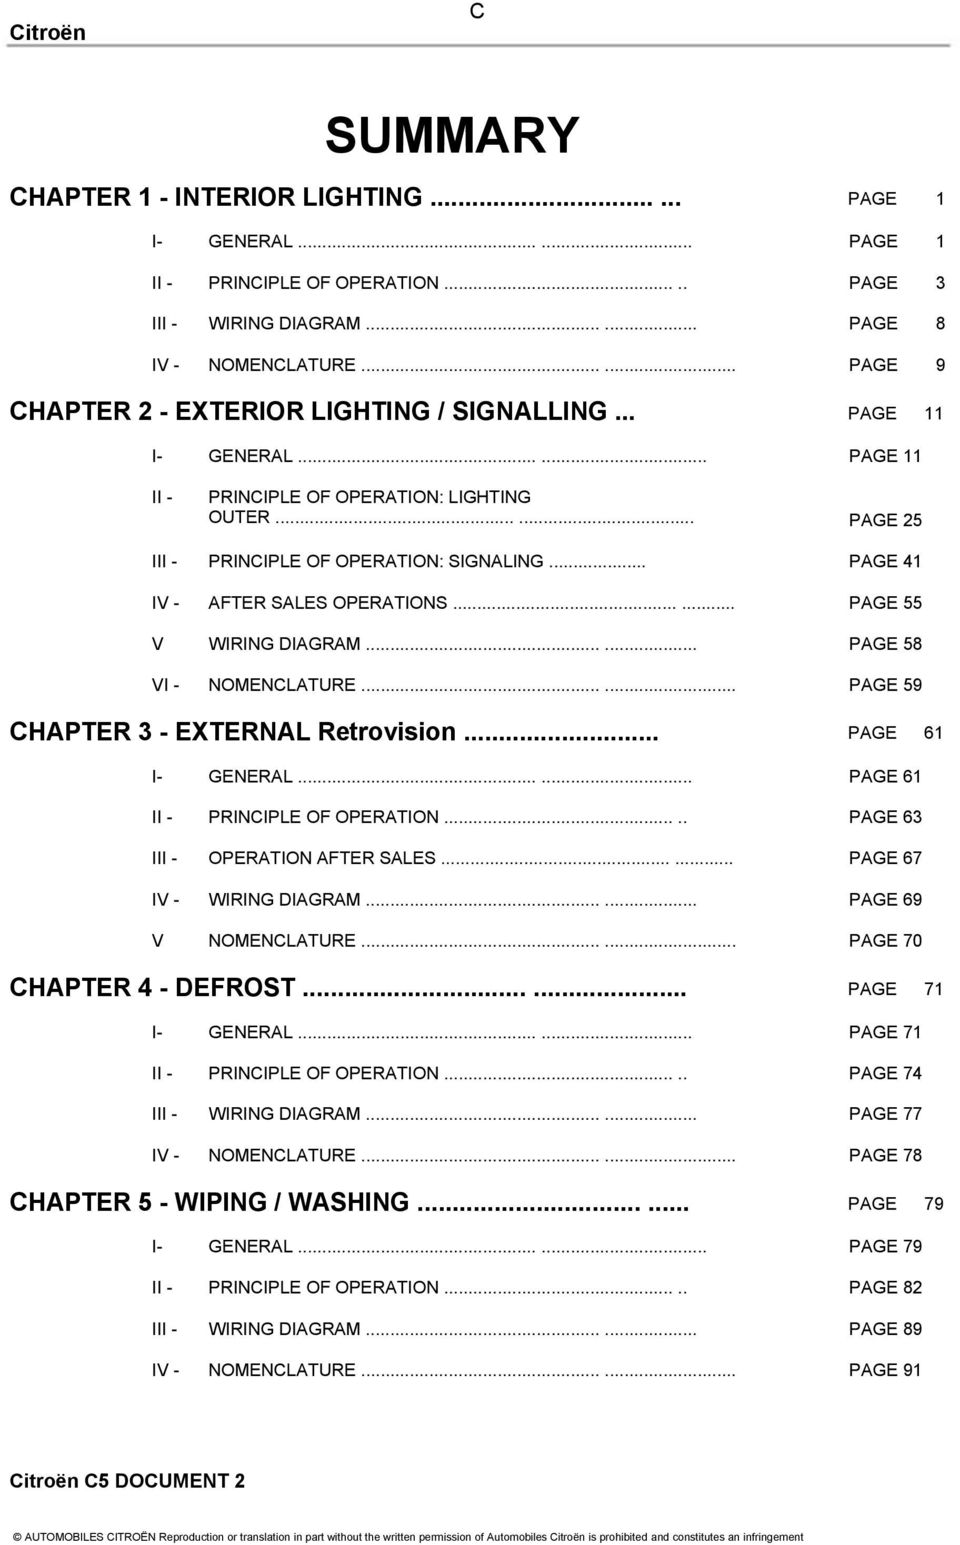 hight resolution of citroen c5 document 2 pdf wiring diagram